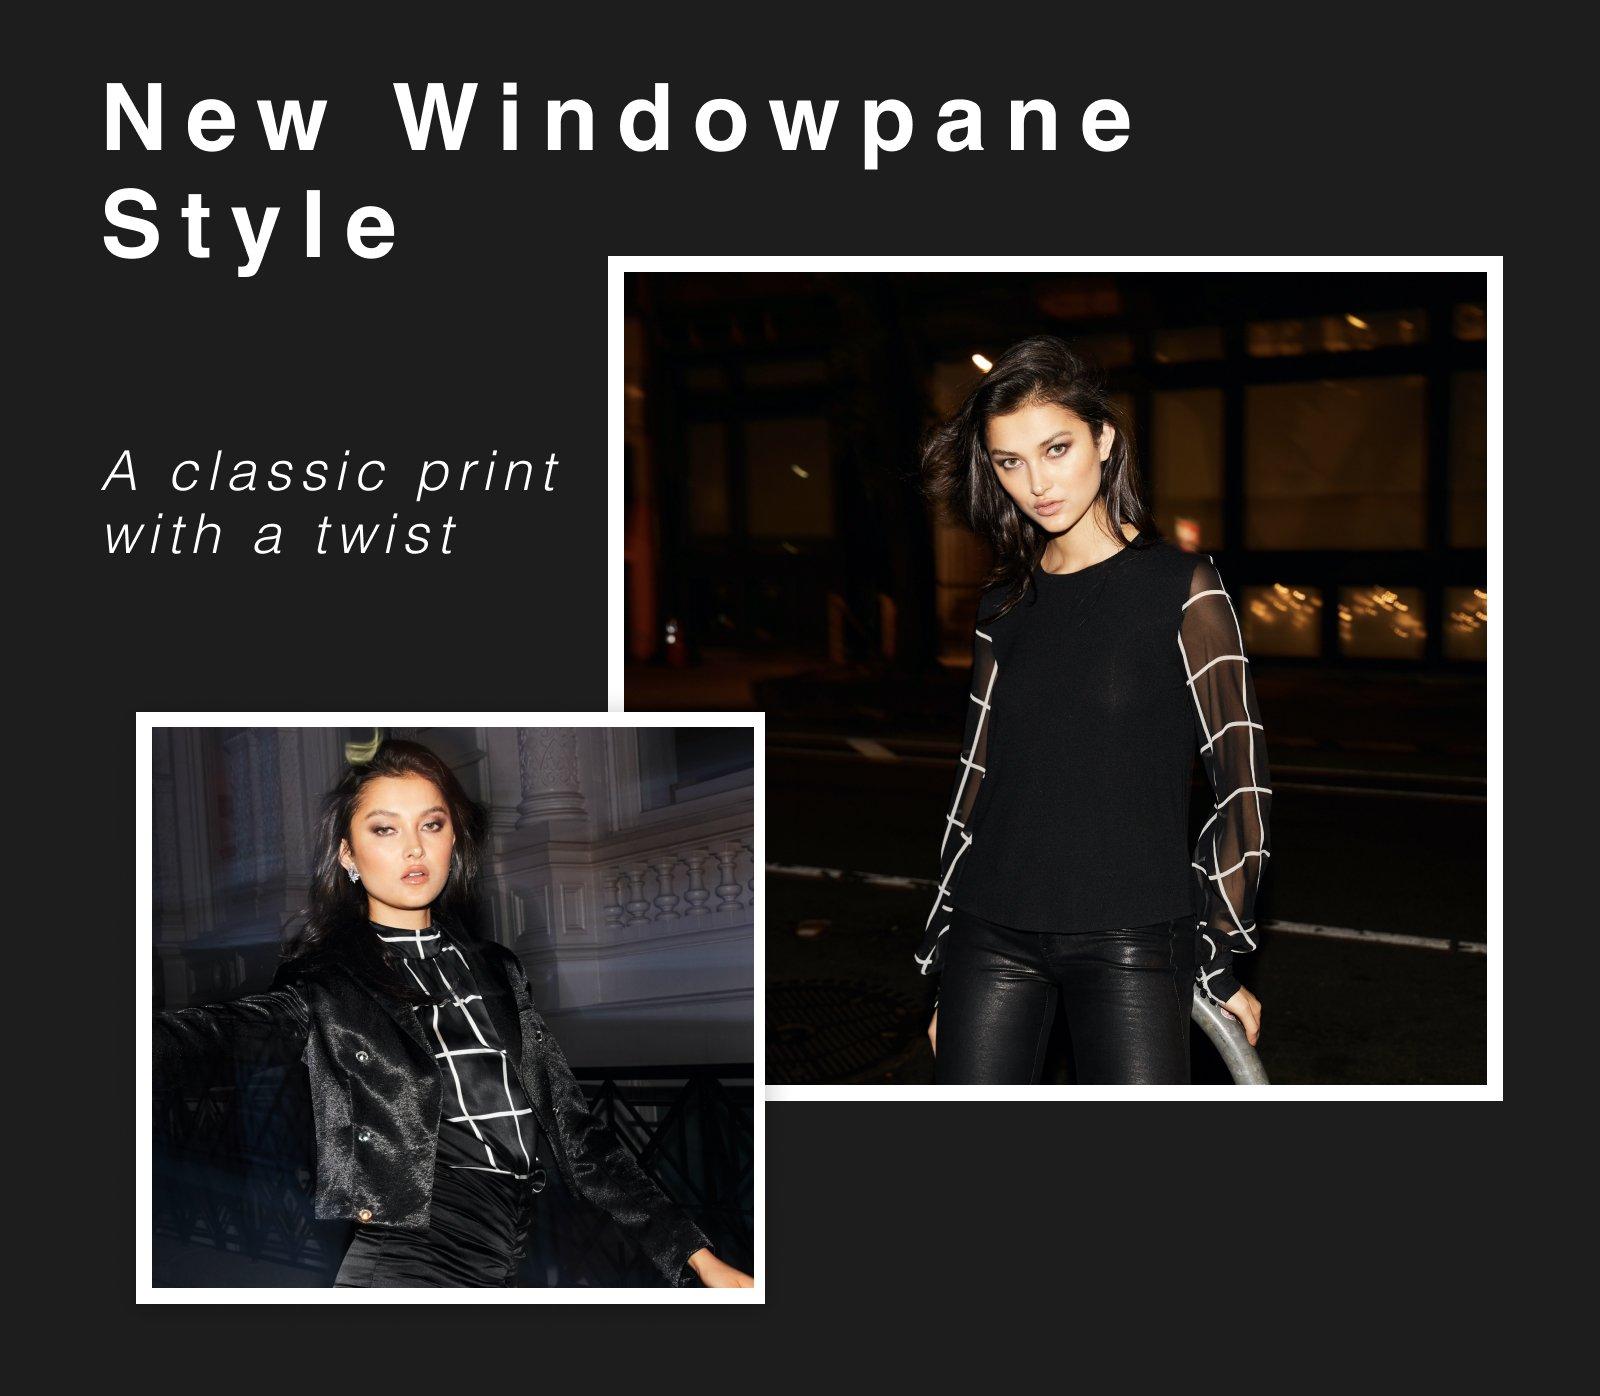 New Windowpane Style